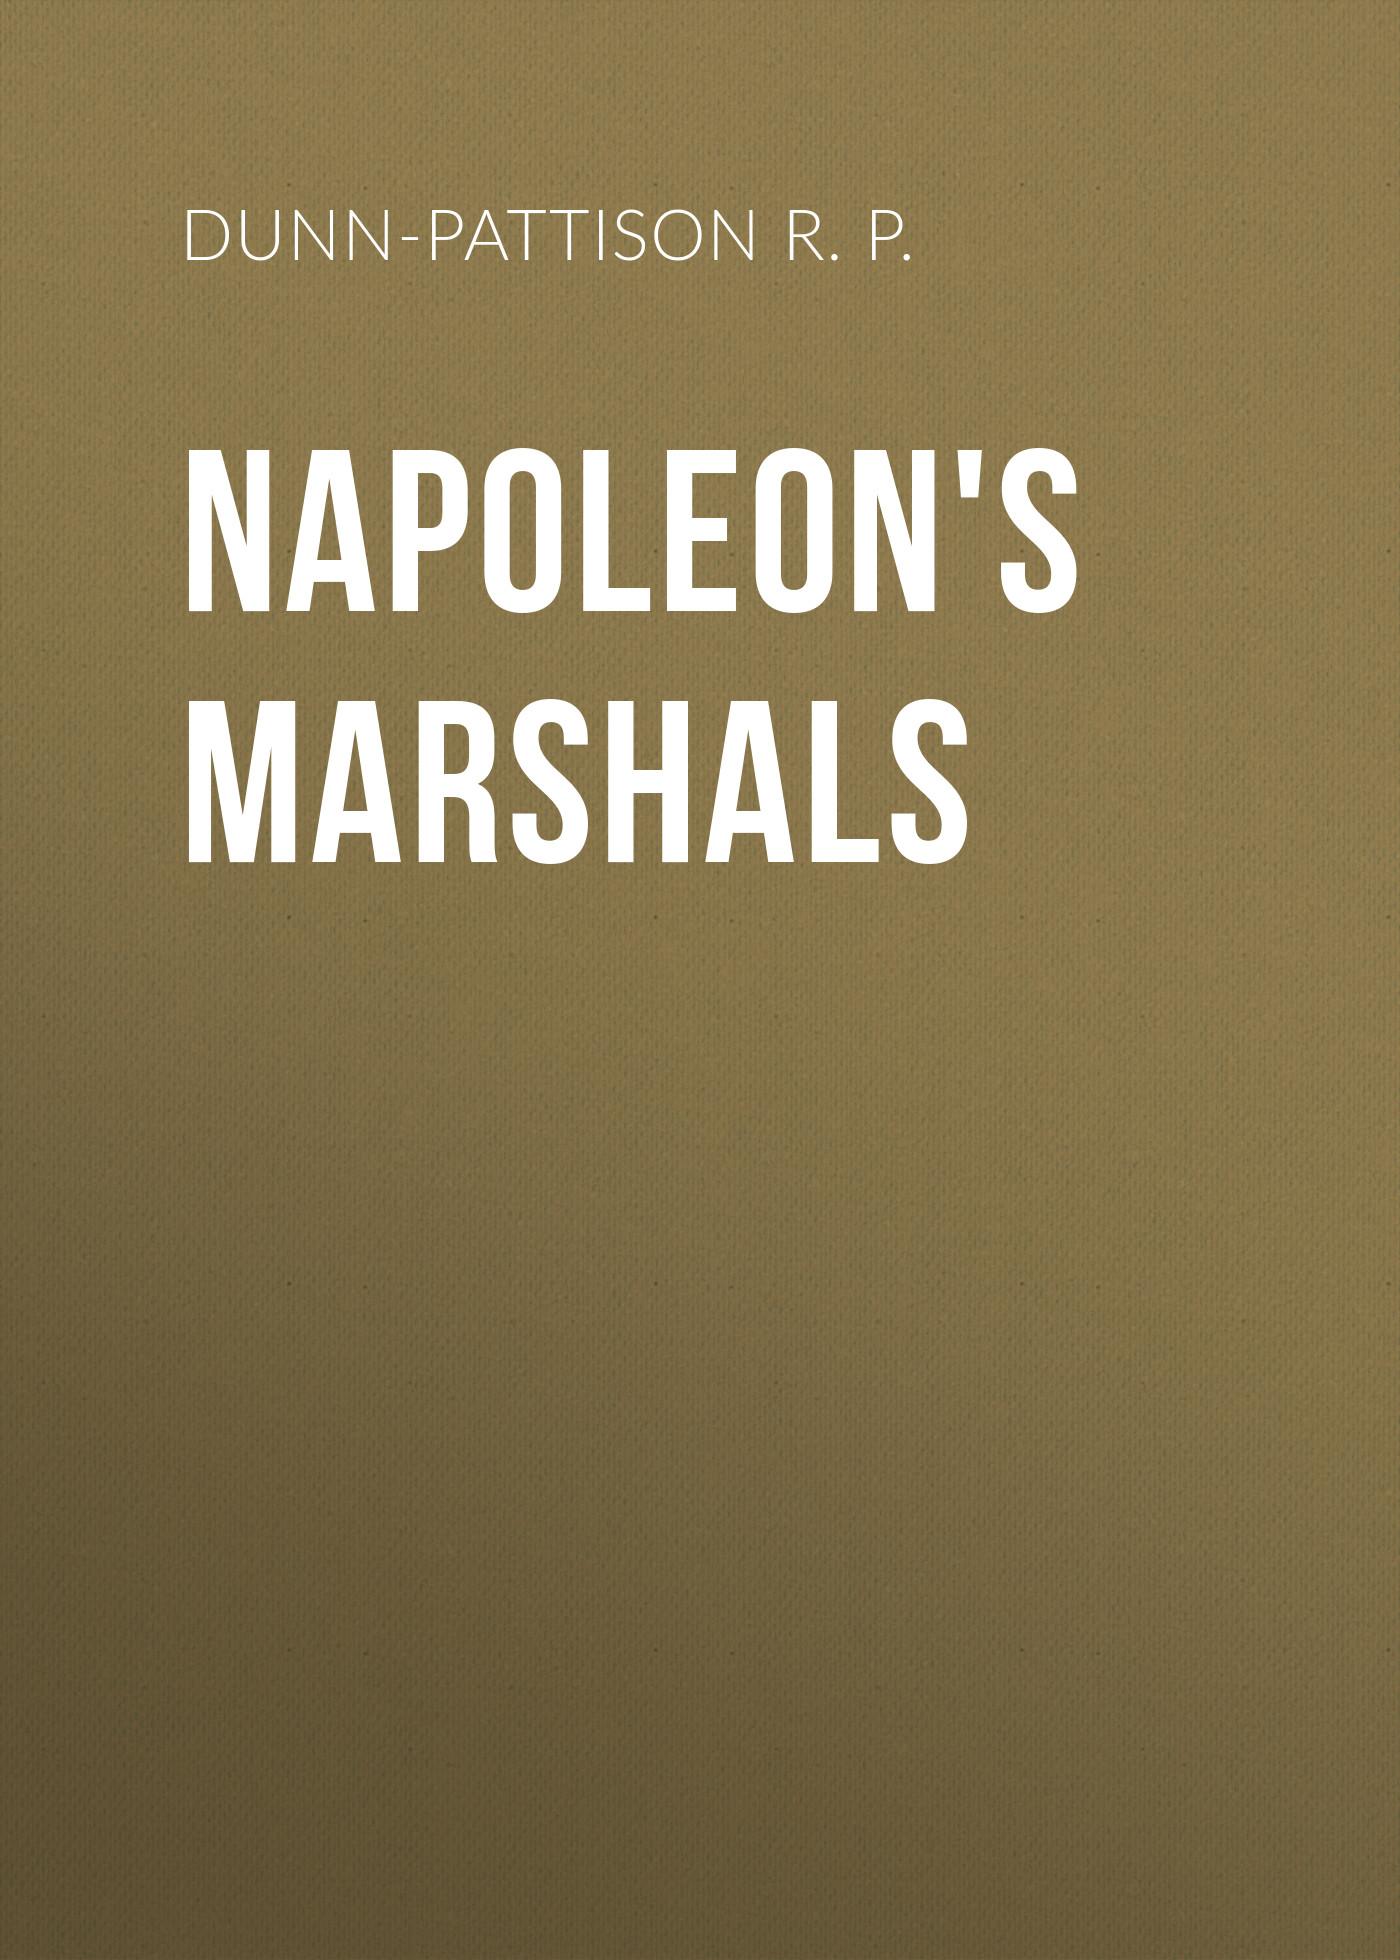 Dunn-Pattison R. P. Napoleon's Marshals аптечка полимербыт 6 5 л с вкладышем